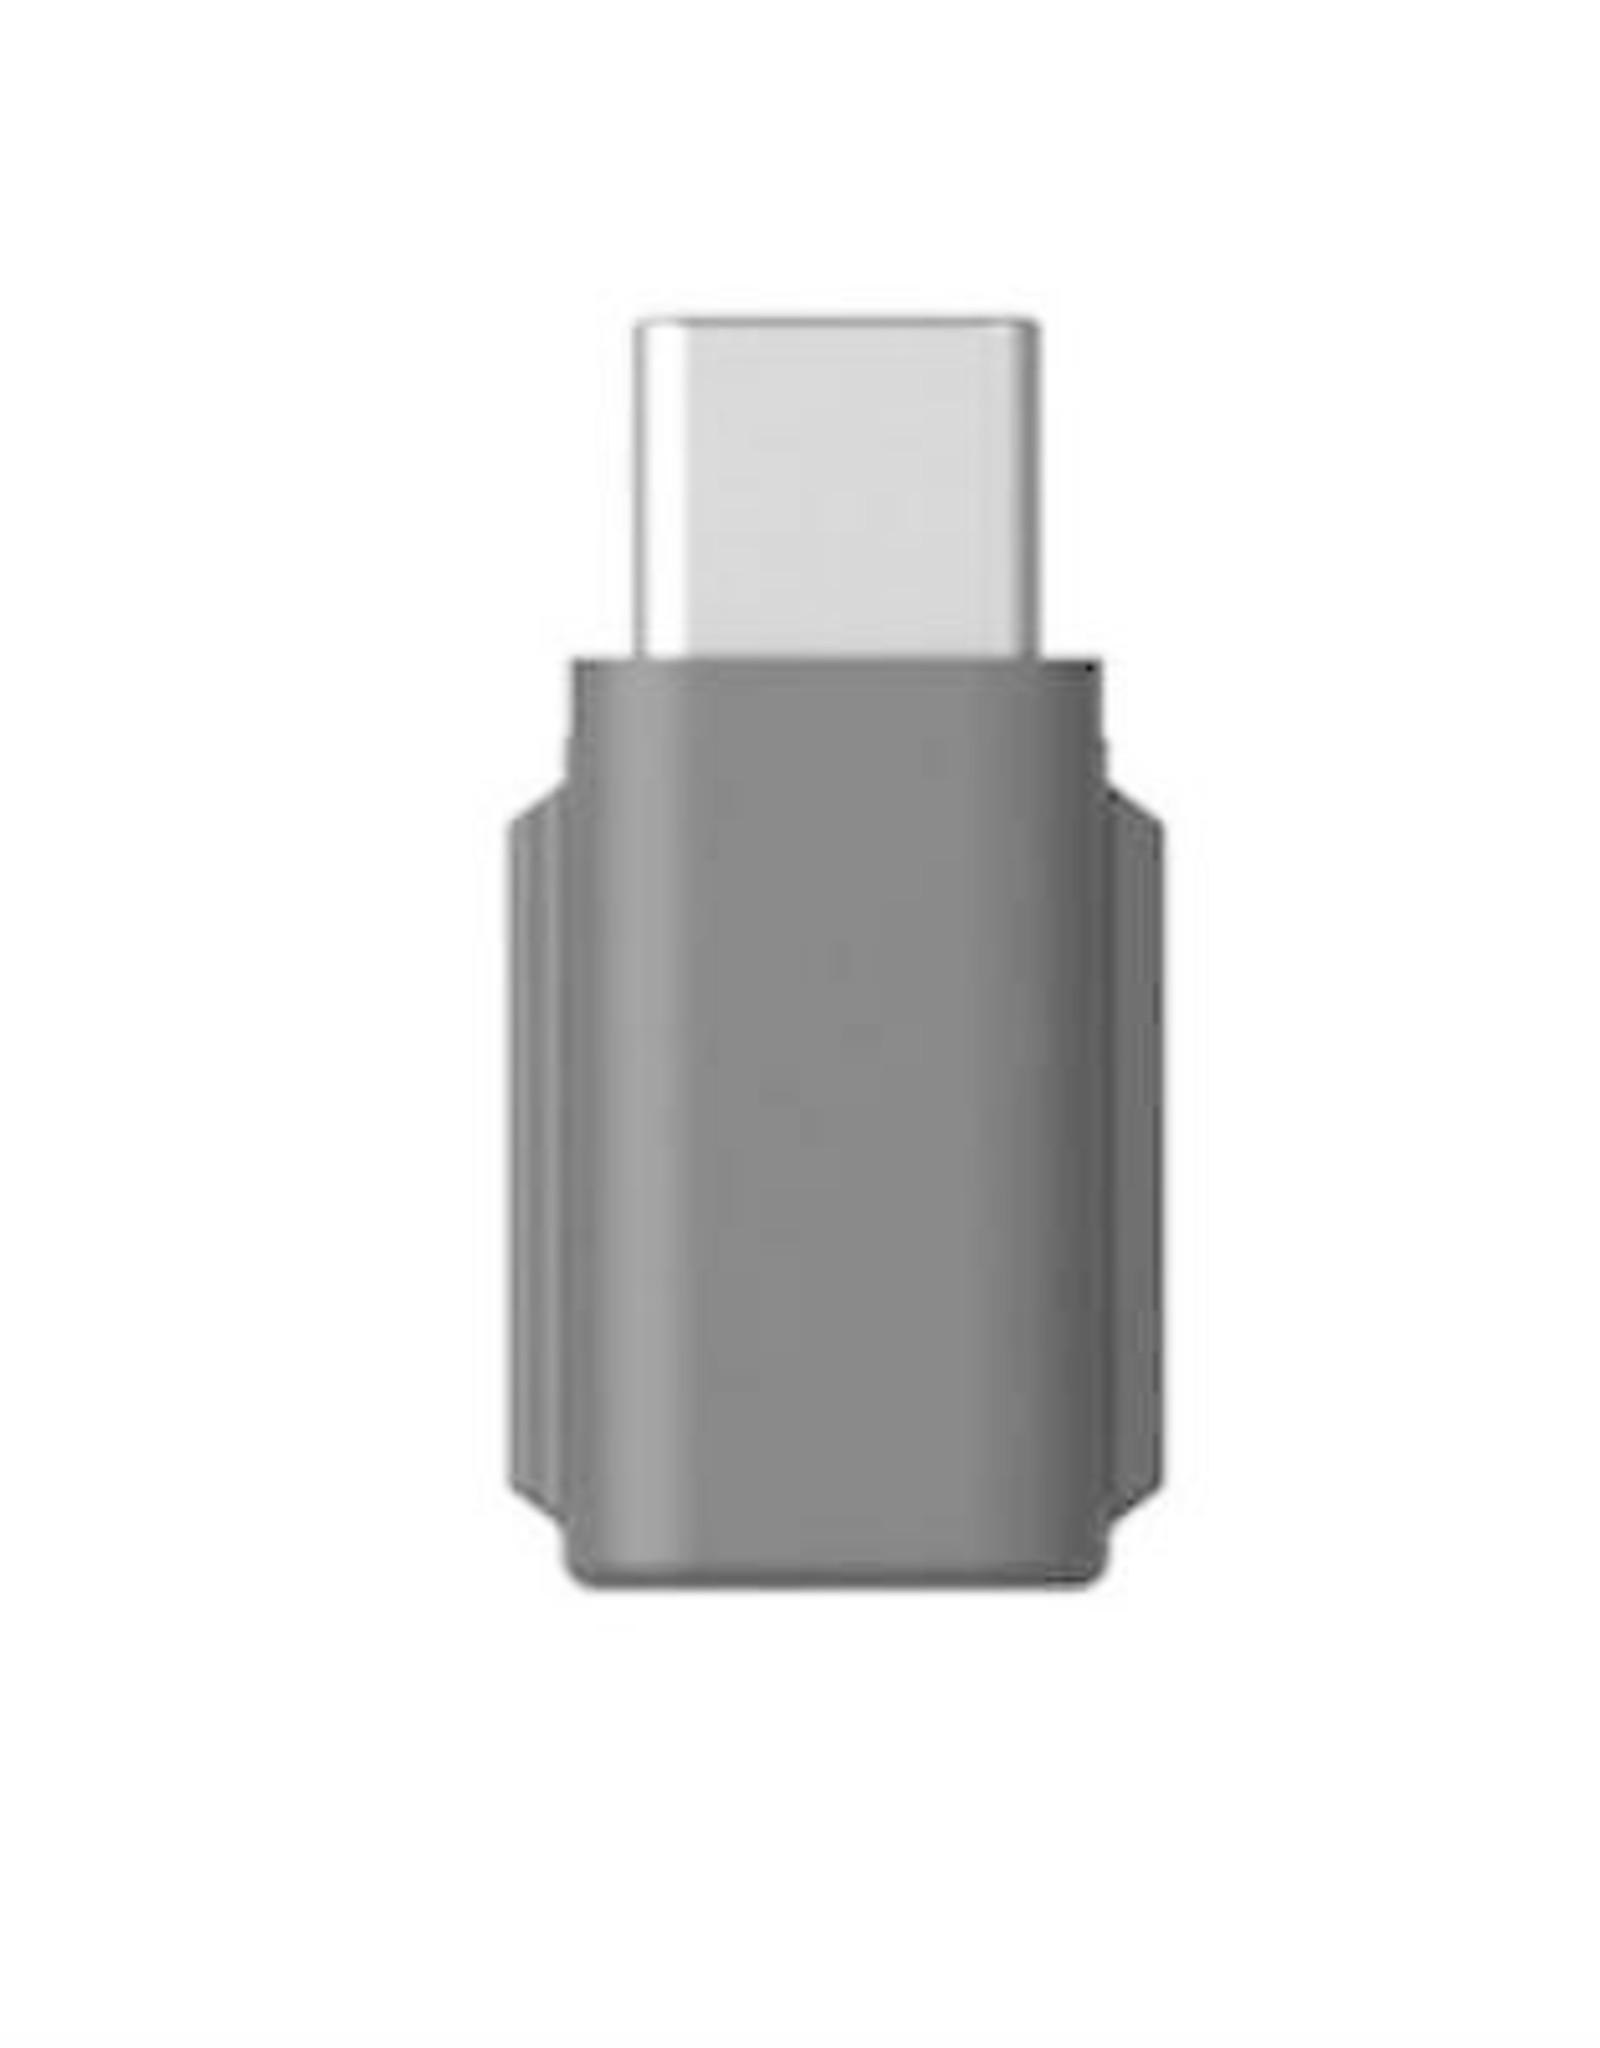 DJI DJI Accessory CP.OS.00000019.01 Osmo Pocket Part 12 Smartphone Retail USB C 225466